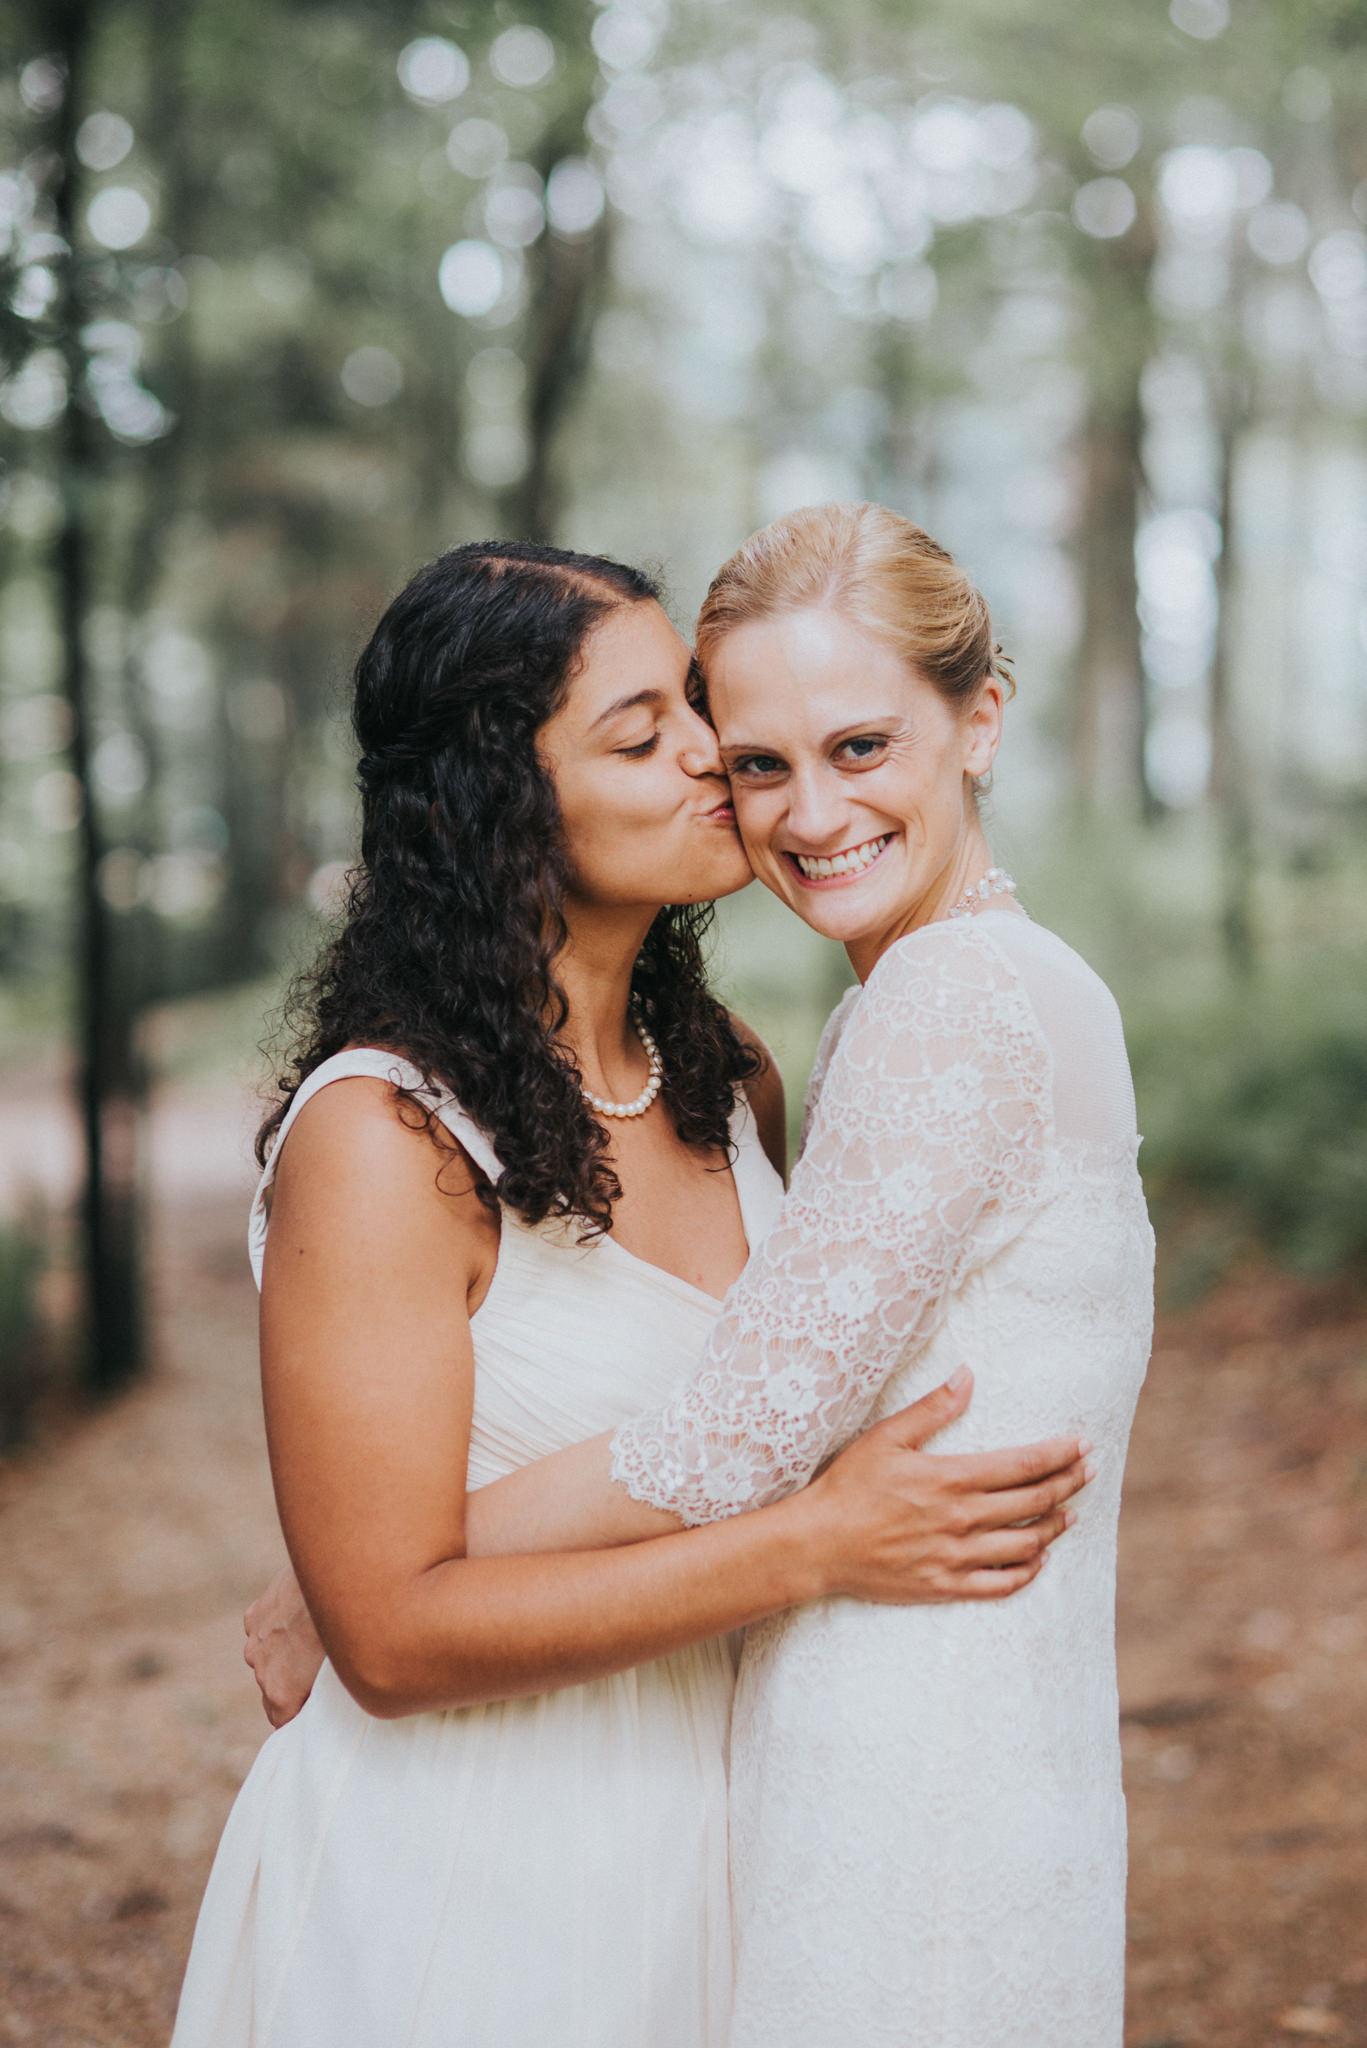 Massachusetts Outdoor Camp Gay Wedding Photography | Kai Hayashi Photography